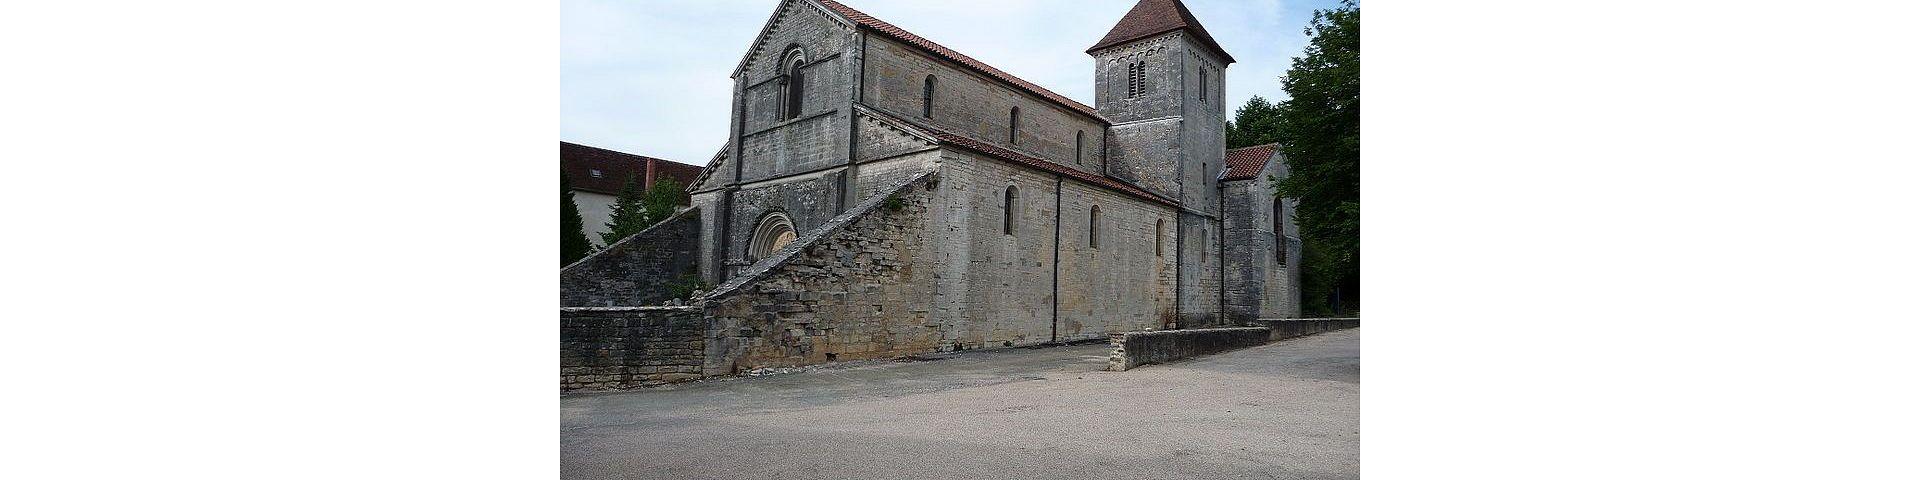 Courtefontaine - Eglise (39)